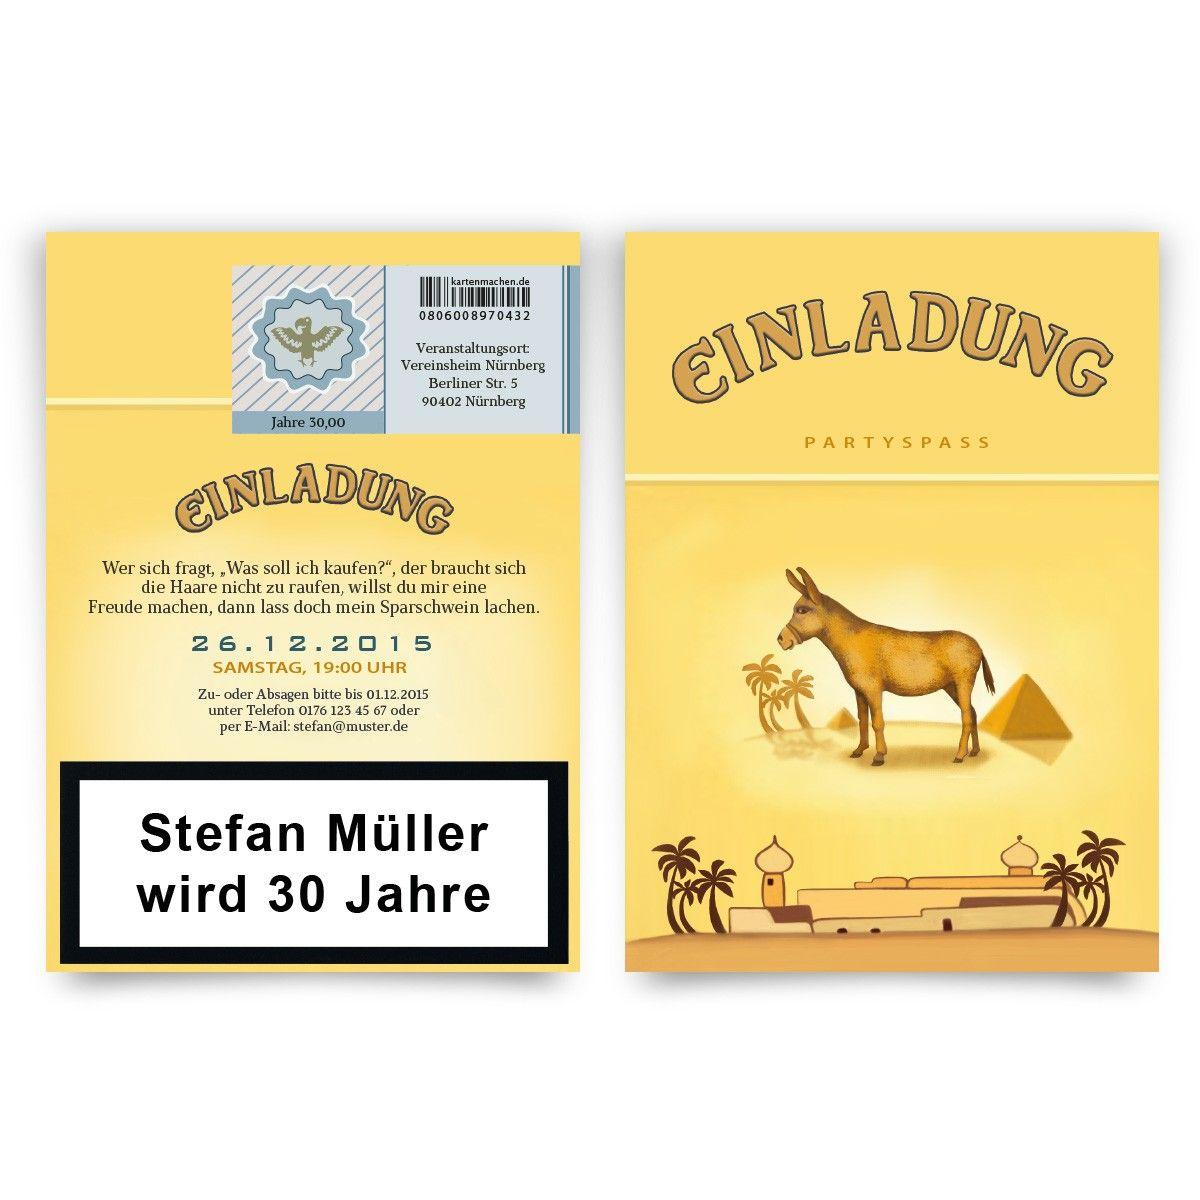 Einladungskarten Als Zigarettenschachtel #geburtstag #einladung  #geburtstagseinladung #zigaretten #donkey #camel #